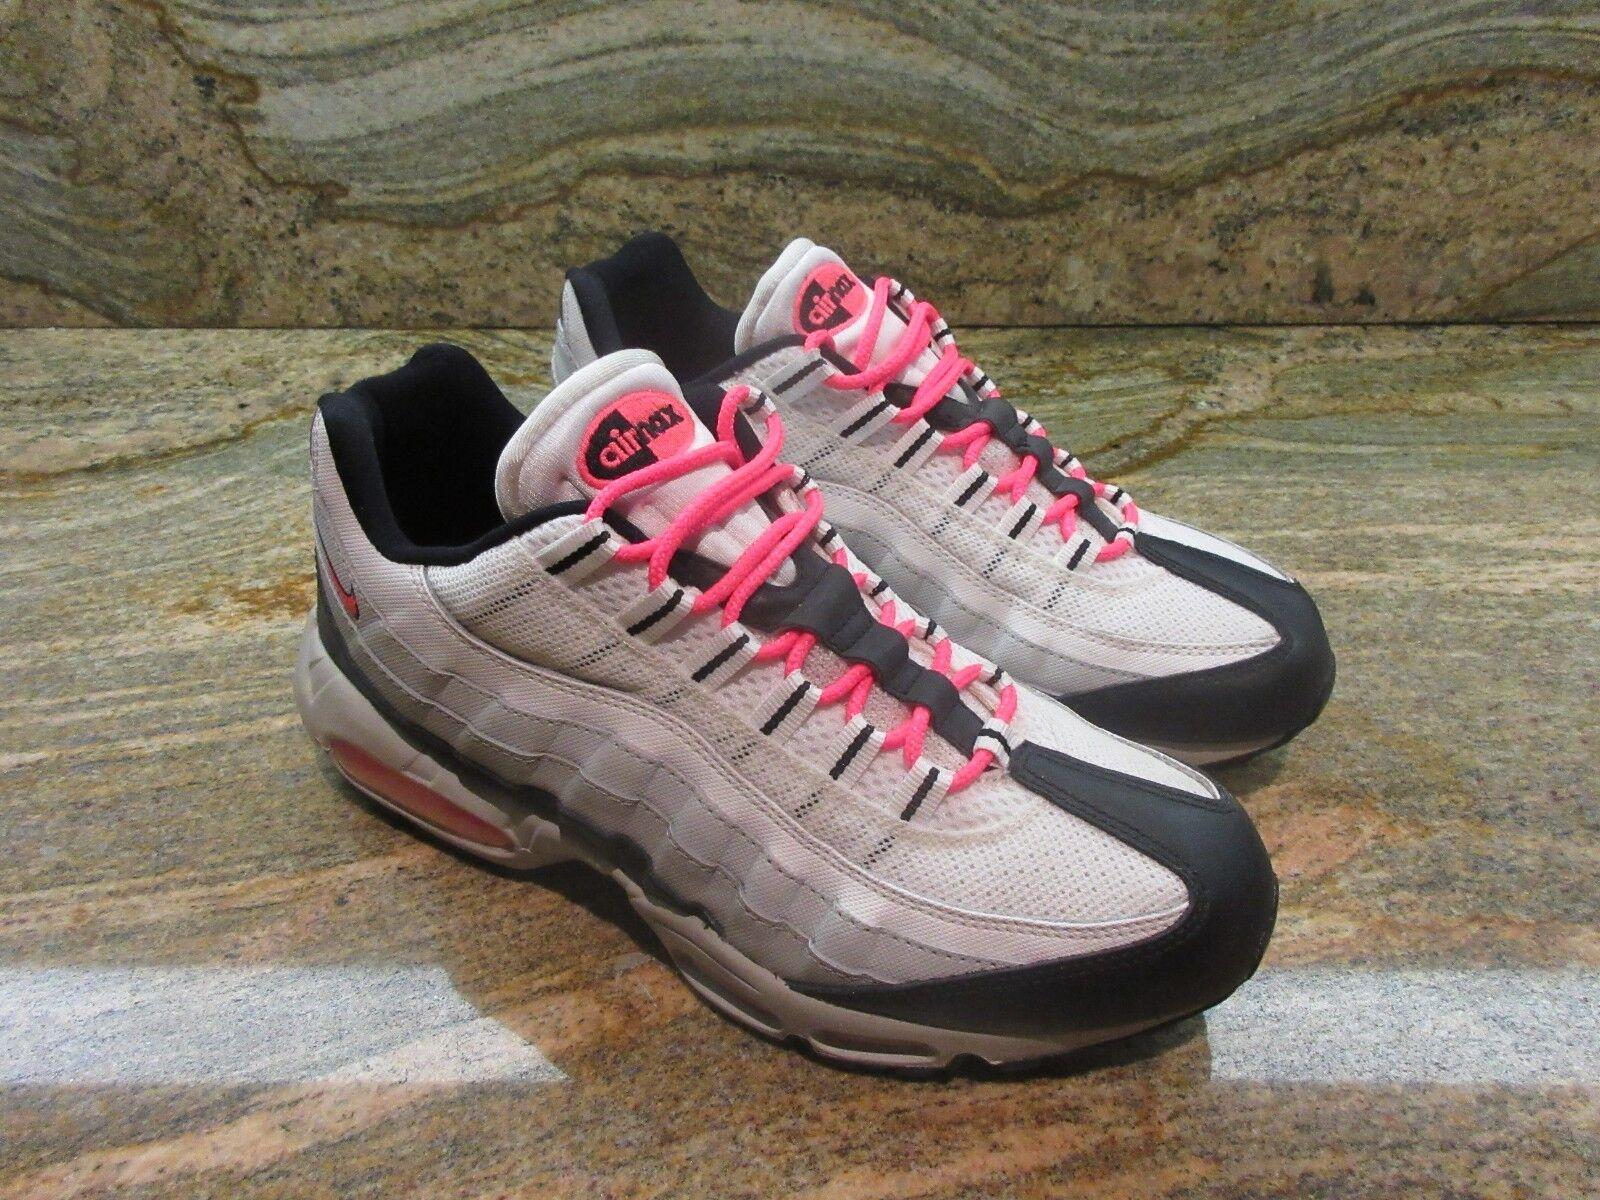 2008 Nike Air Max 95 95 95 Premium SZ 9.5 Hot Lava Rebel Pack Infrarosso OG 609048-182 a251a3